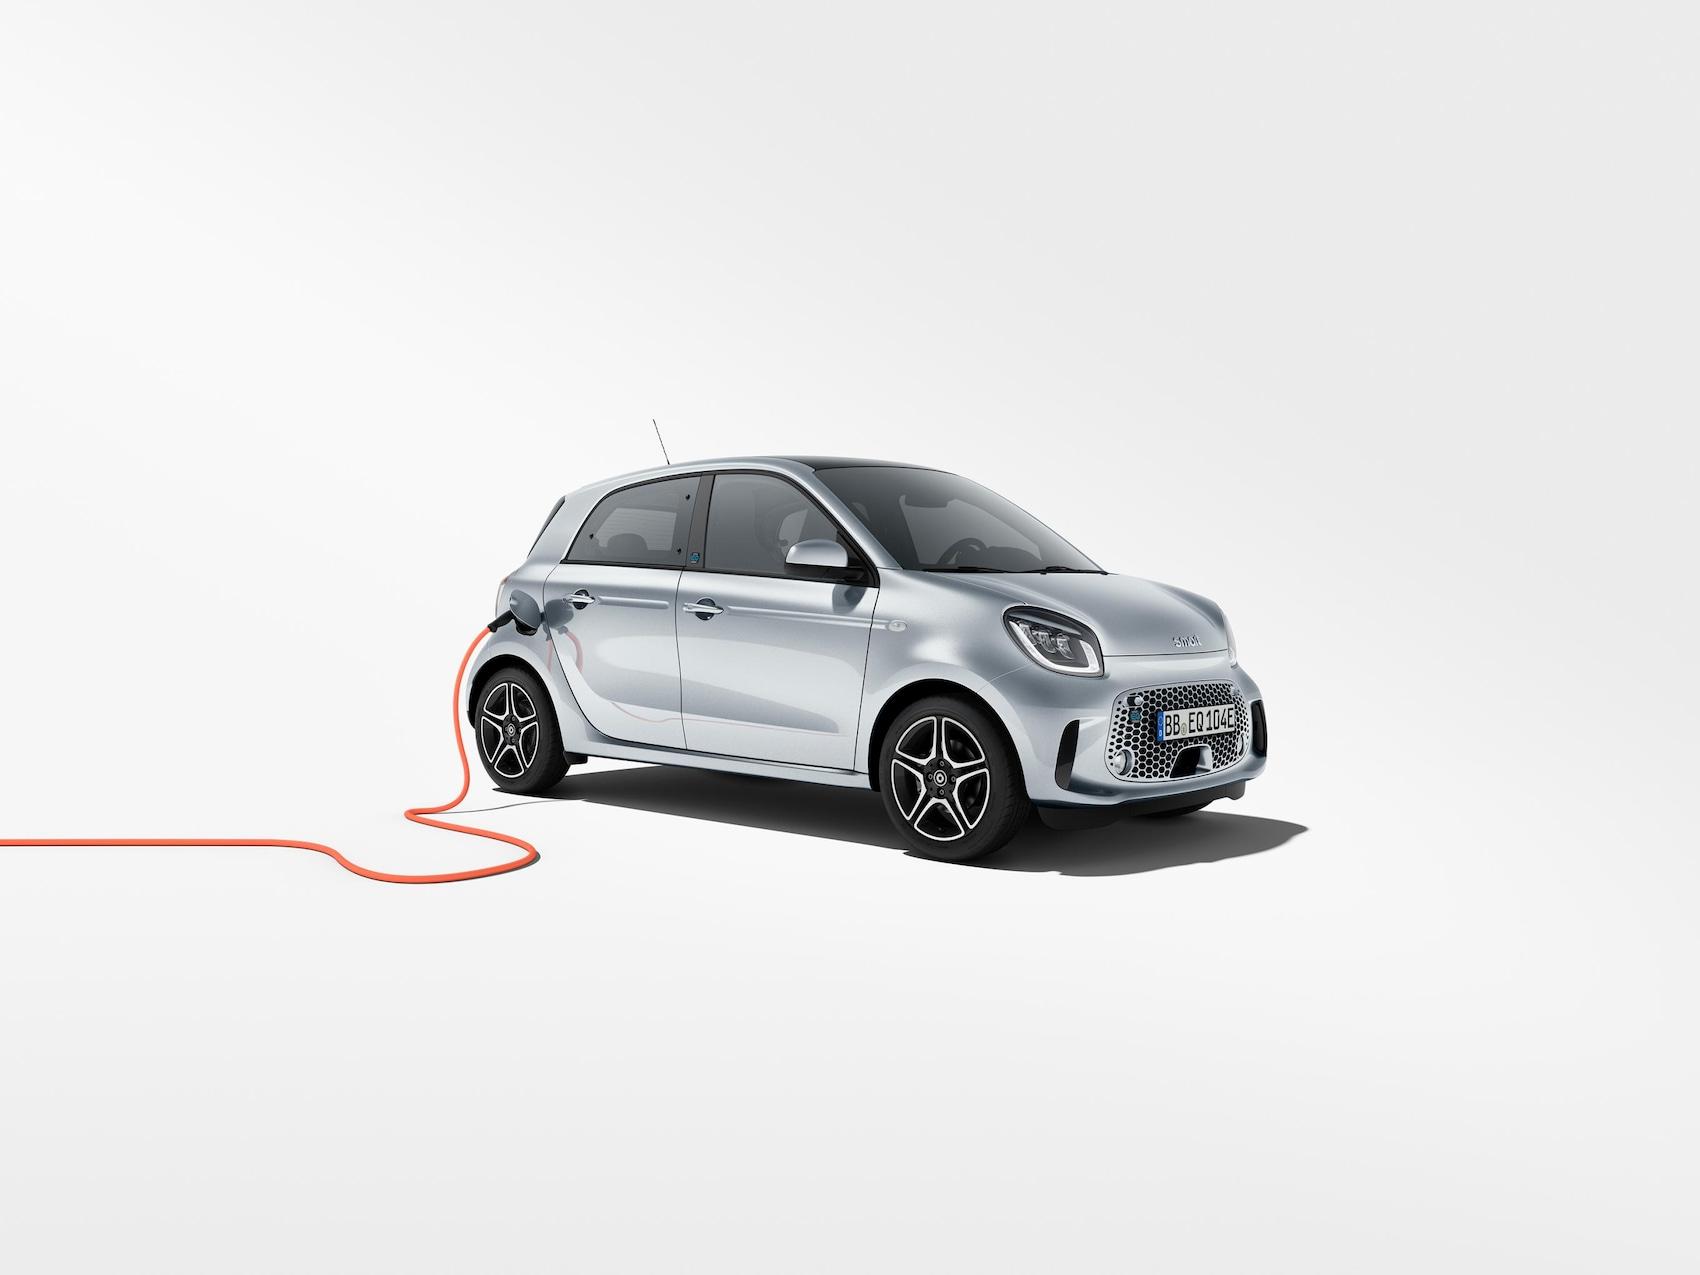 smart EQ forfour en color plata con cable de carga rojo